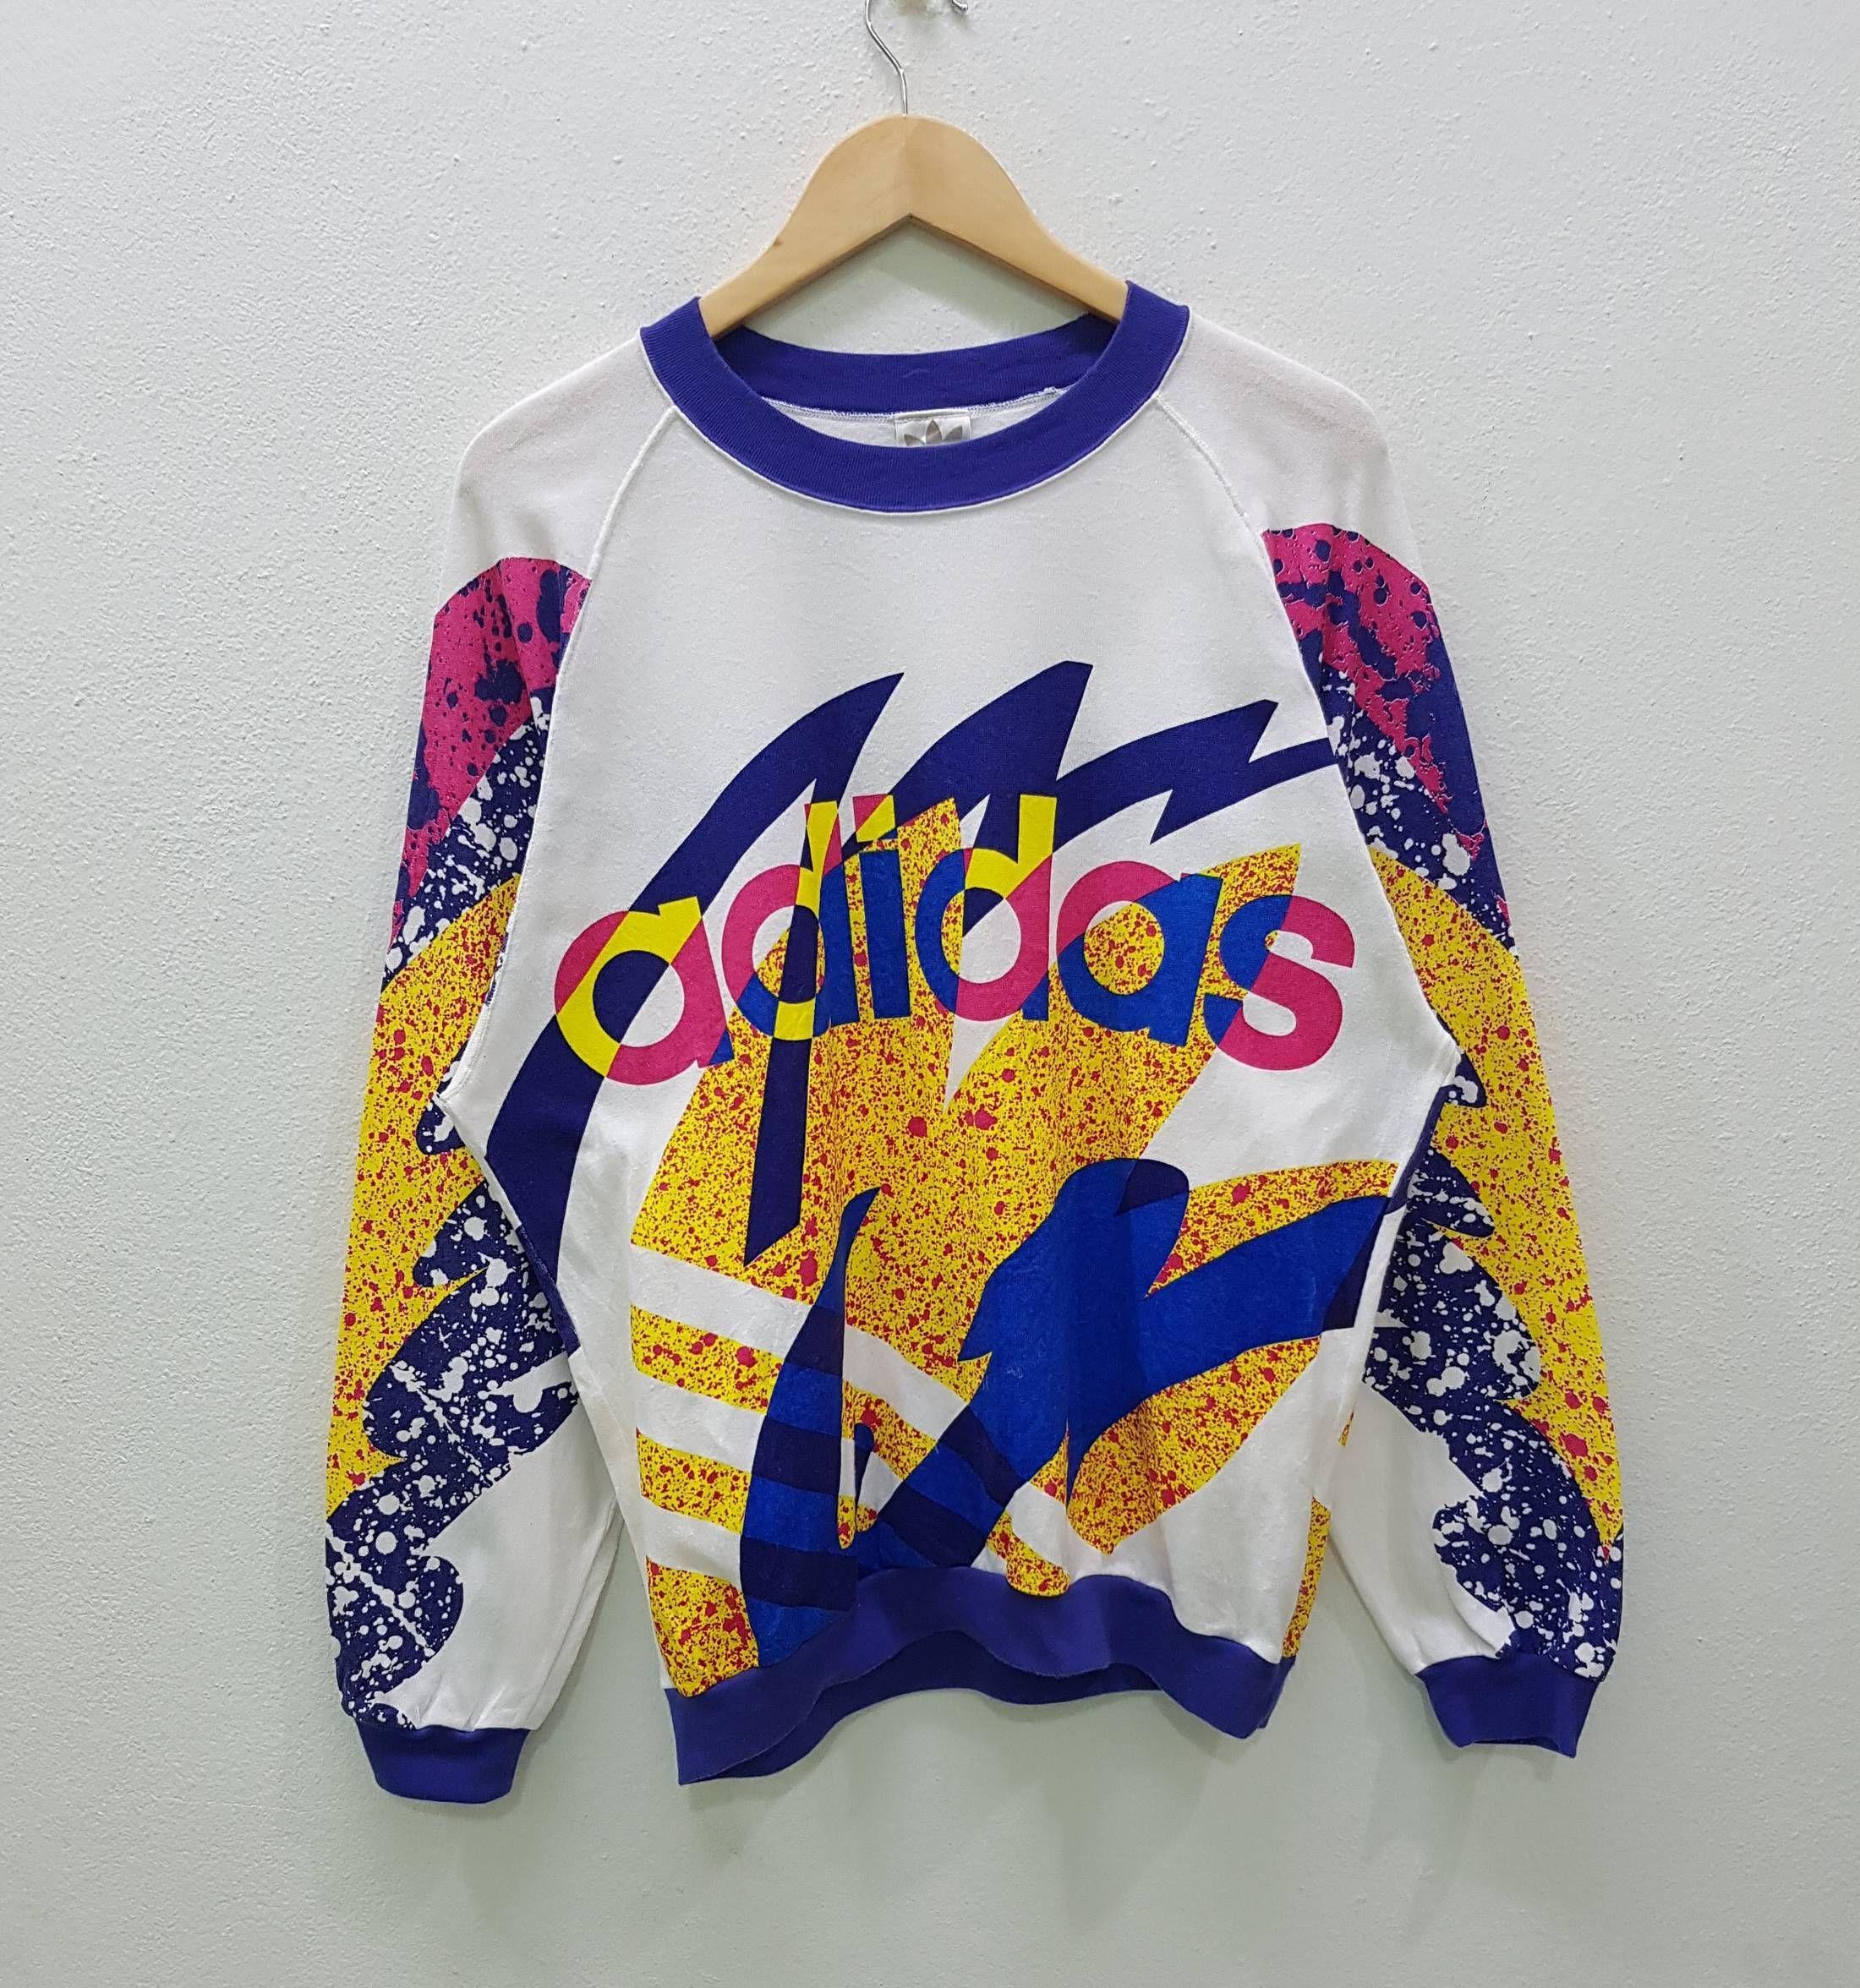 Adidas Vintage Adidas Multicolour Style Sweatshirt Pullover Big Logo Unisex Style Jumper Size Us M Eu 48 Aesthetic Clothes Clothes Adidas Sweatshirt Outfits [ 2352 x 2200 Pixel ]